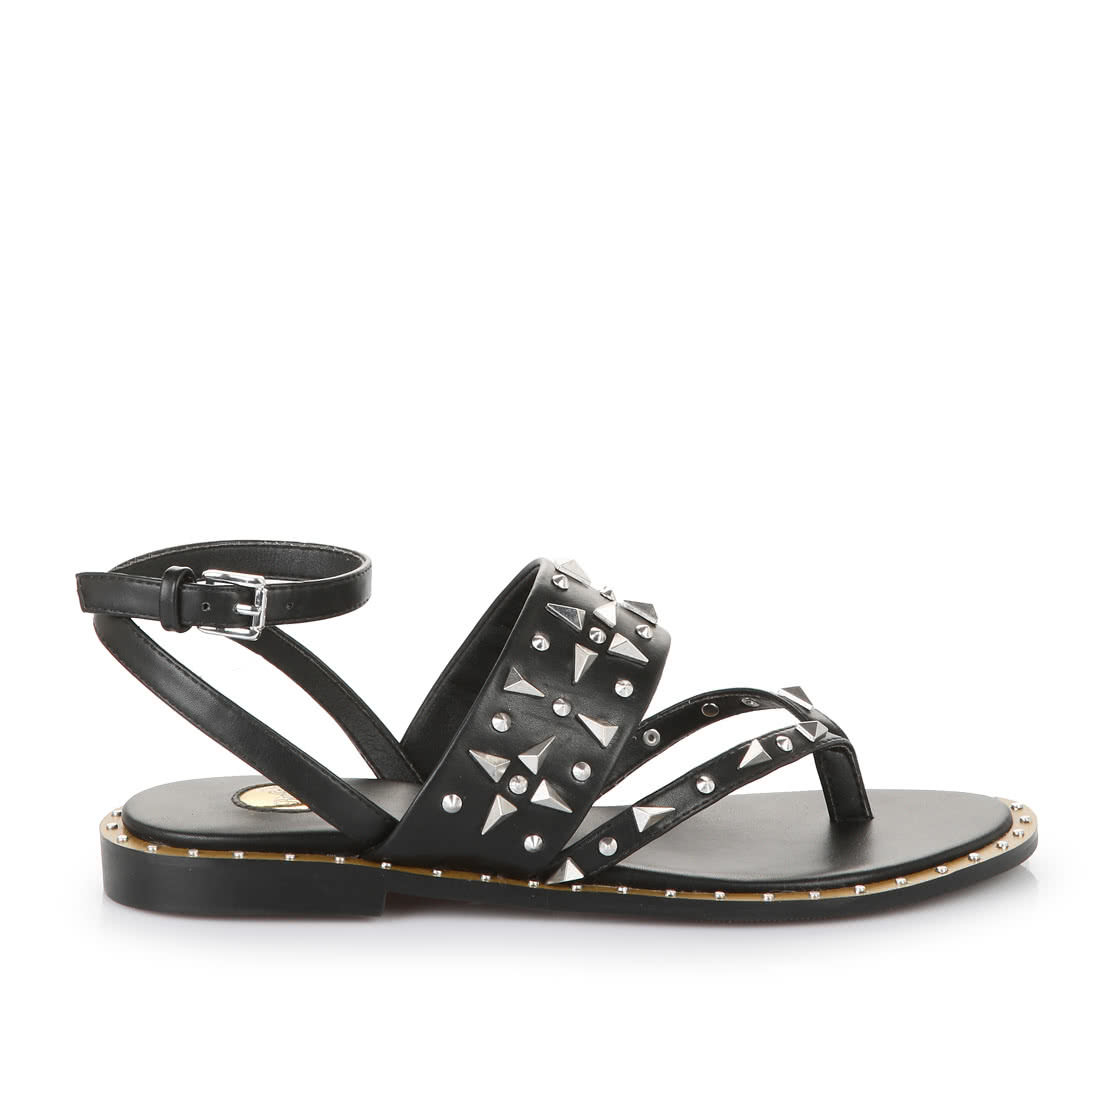 5ecfda7e7d8f Buffalo flip flop sandals in black with studs buy online in BUFFALO ...